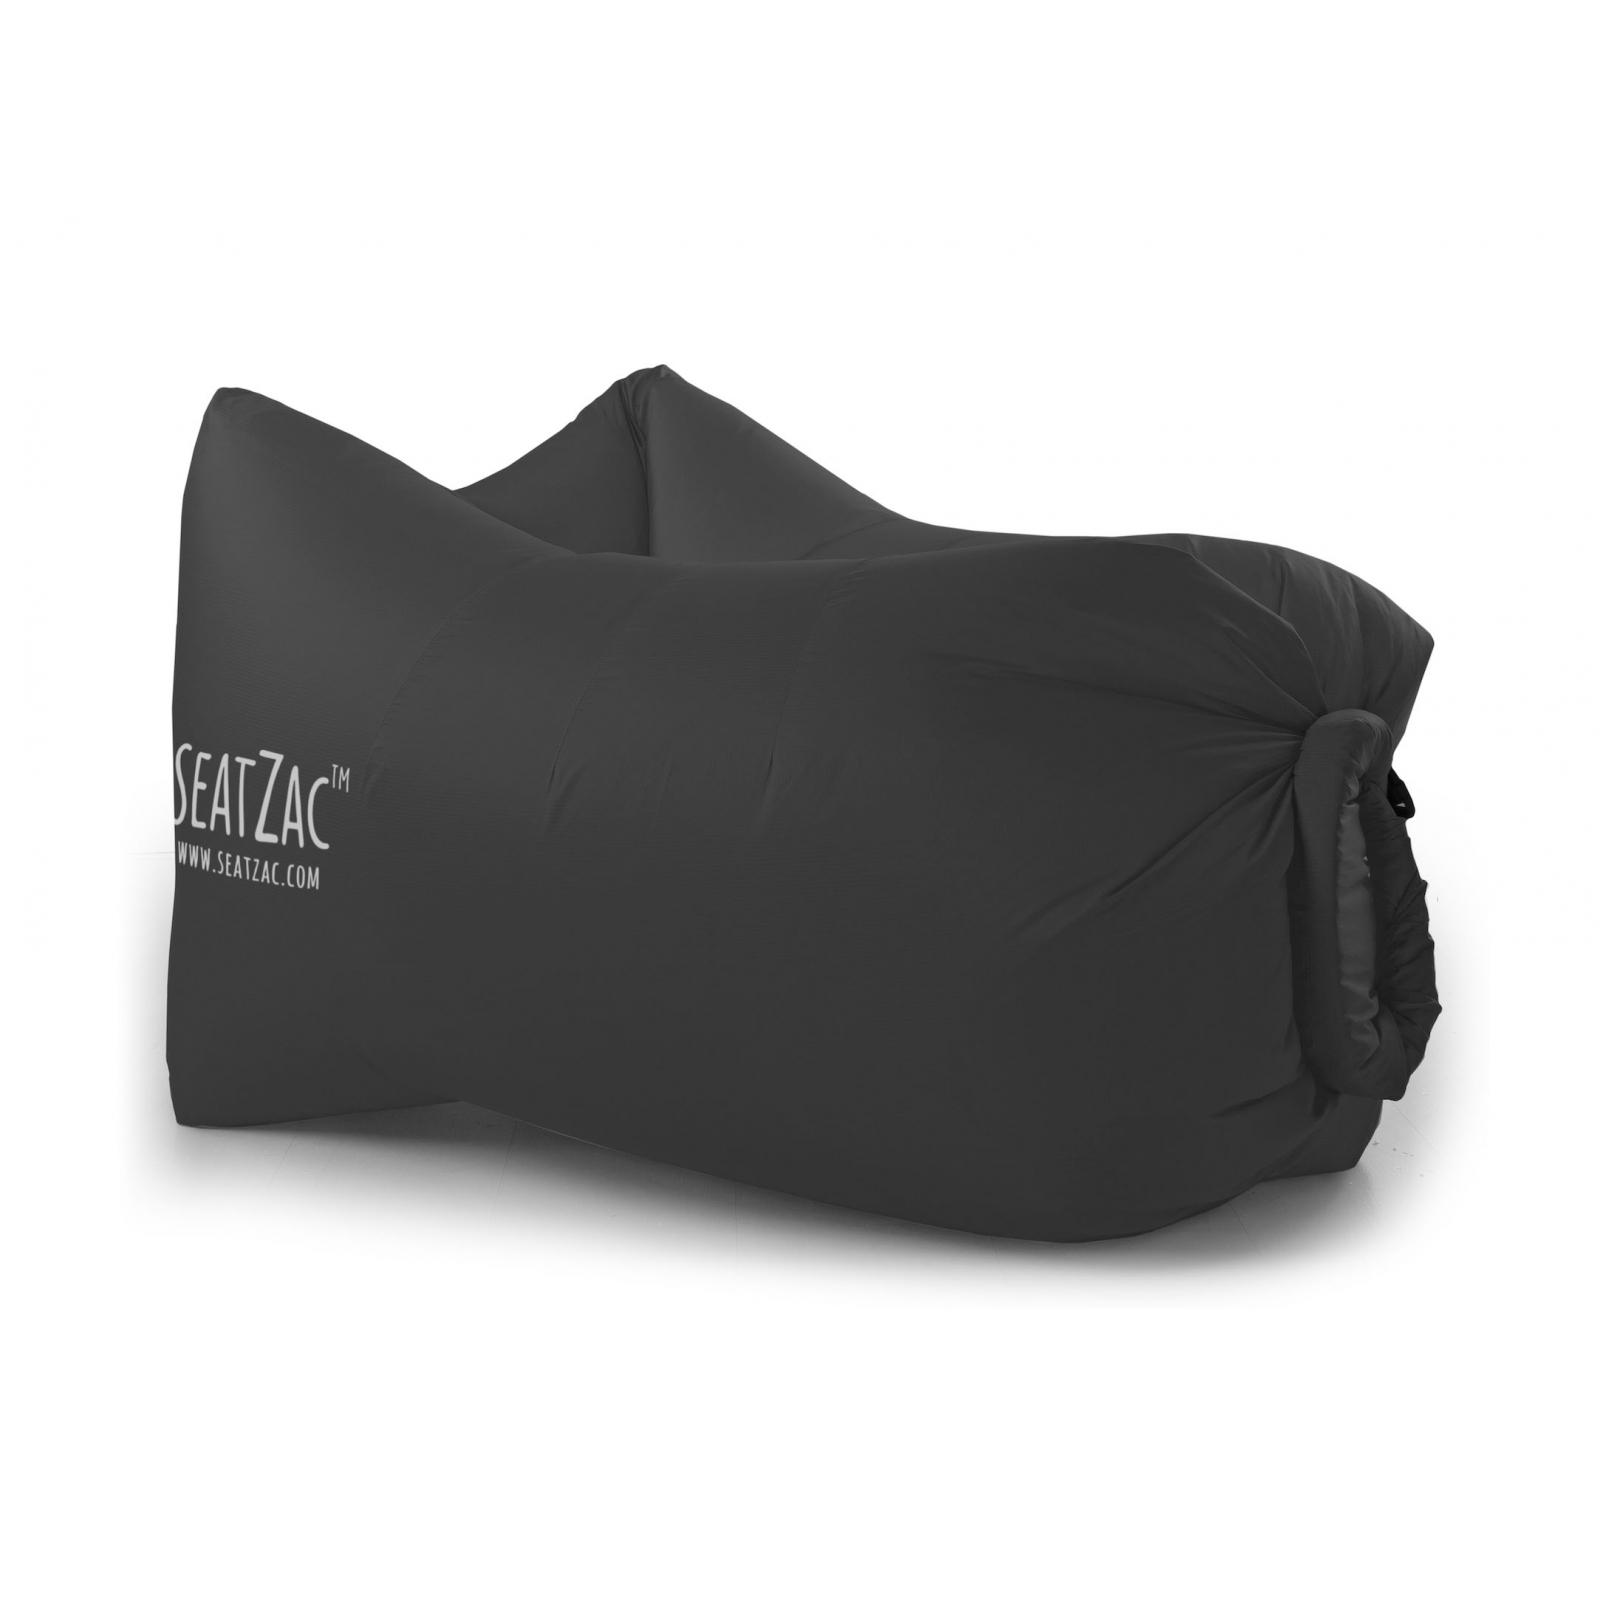 seatzac chillbag polyester inkl tragetasche schwarz sitzsack luftsack luftsofa 4053682252386 ebay. Black Bedroom Furniture Sets. Home Design Ideas